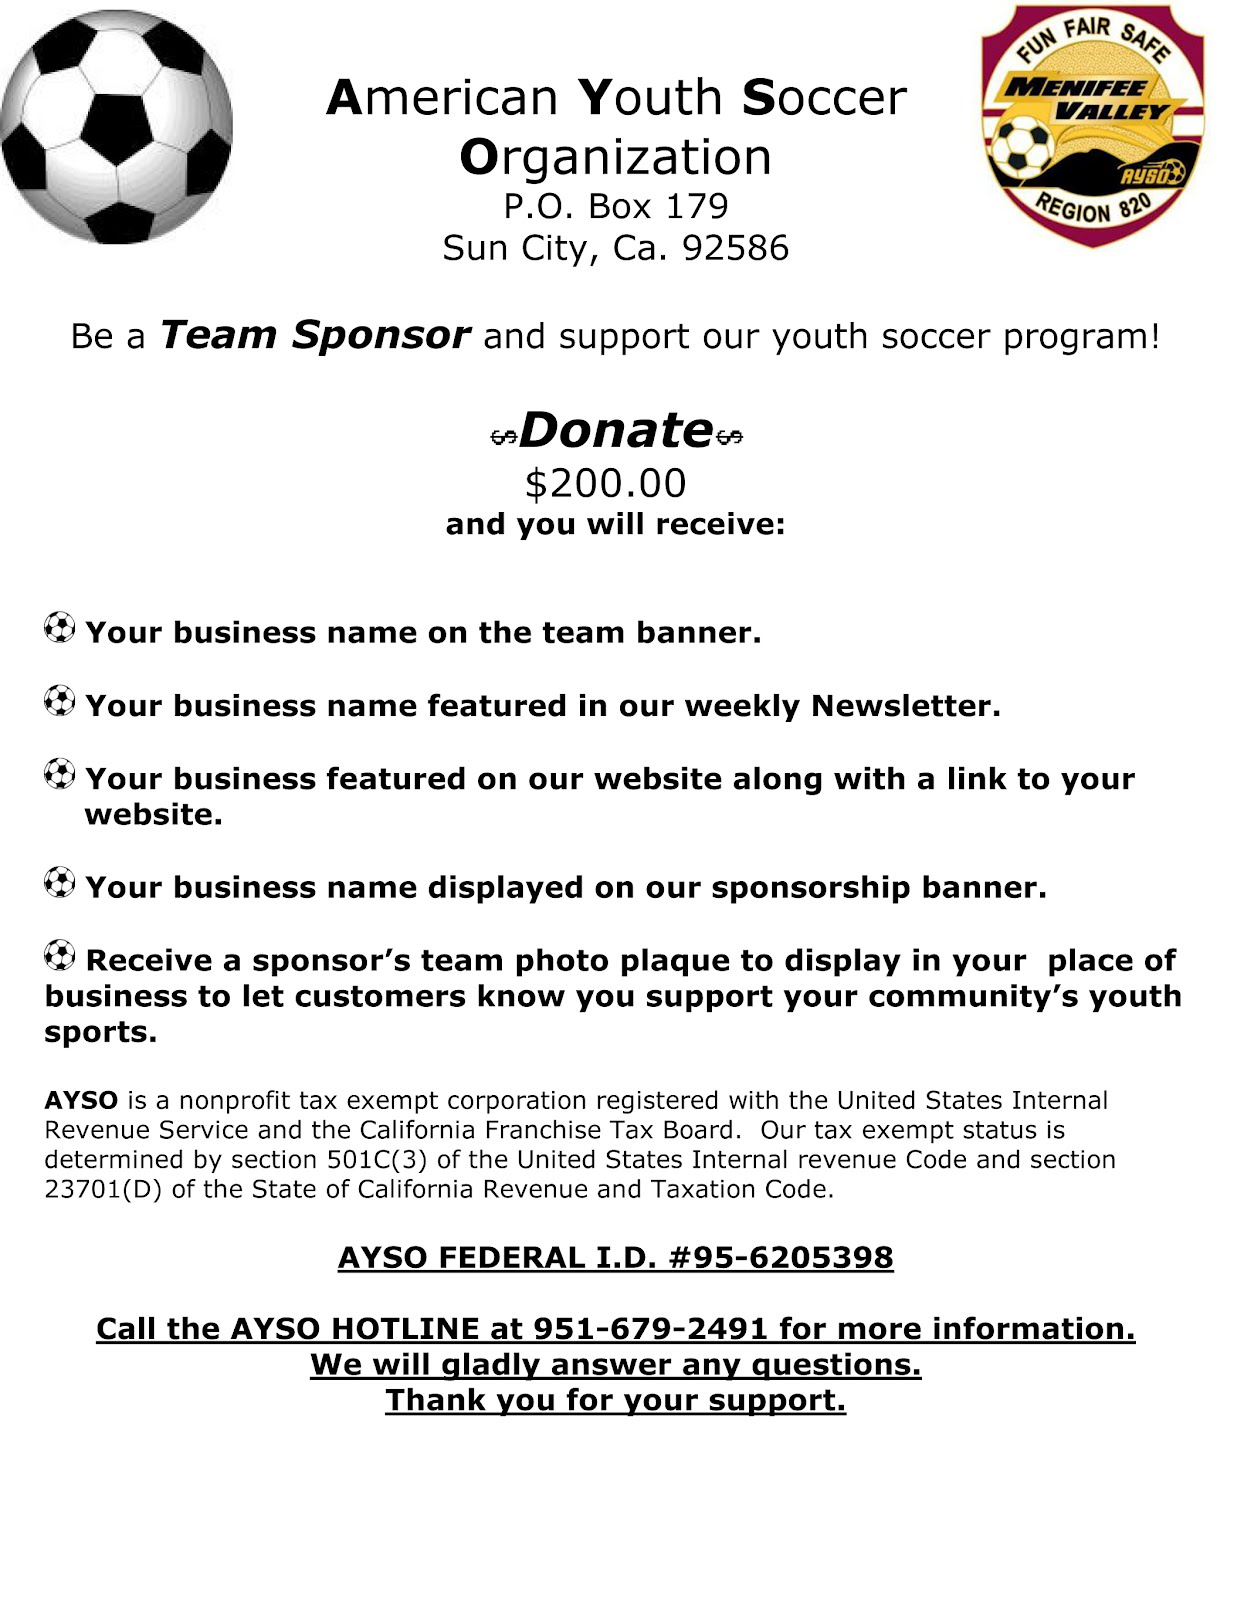 AYSO%2BSponsor%2BForm-1 Veteran Sponsorship Letter Template on youth football, little league baseball, free sample, gold platnium sponsors, for job, non-profit corporate, for my dream, for nonprofits,